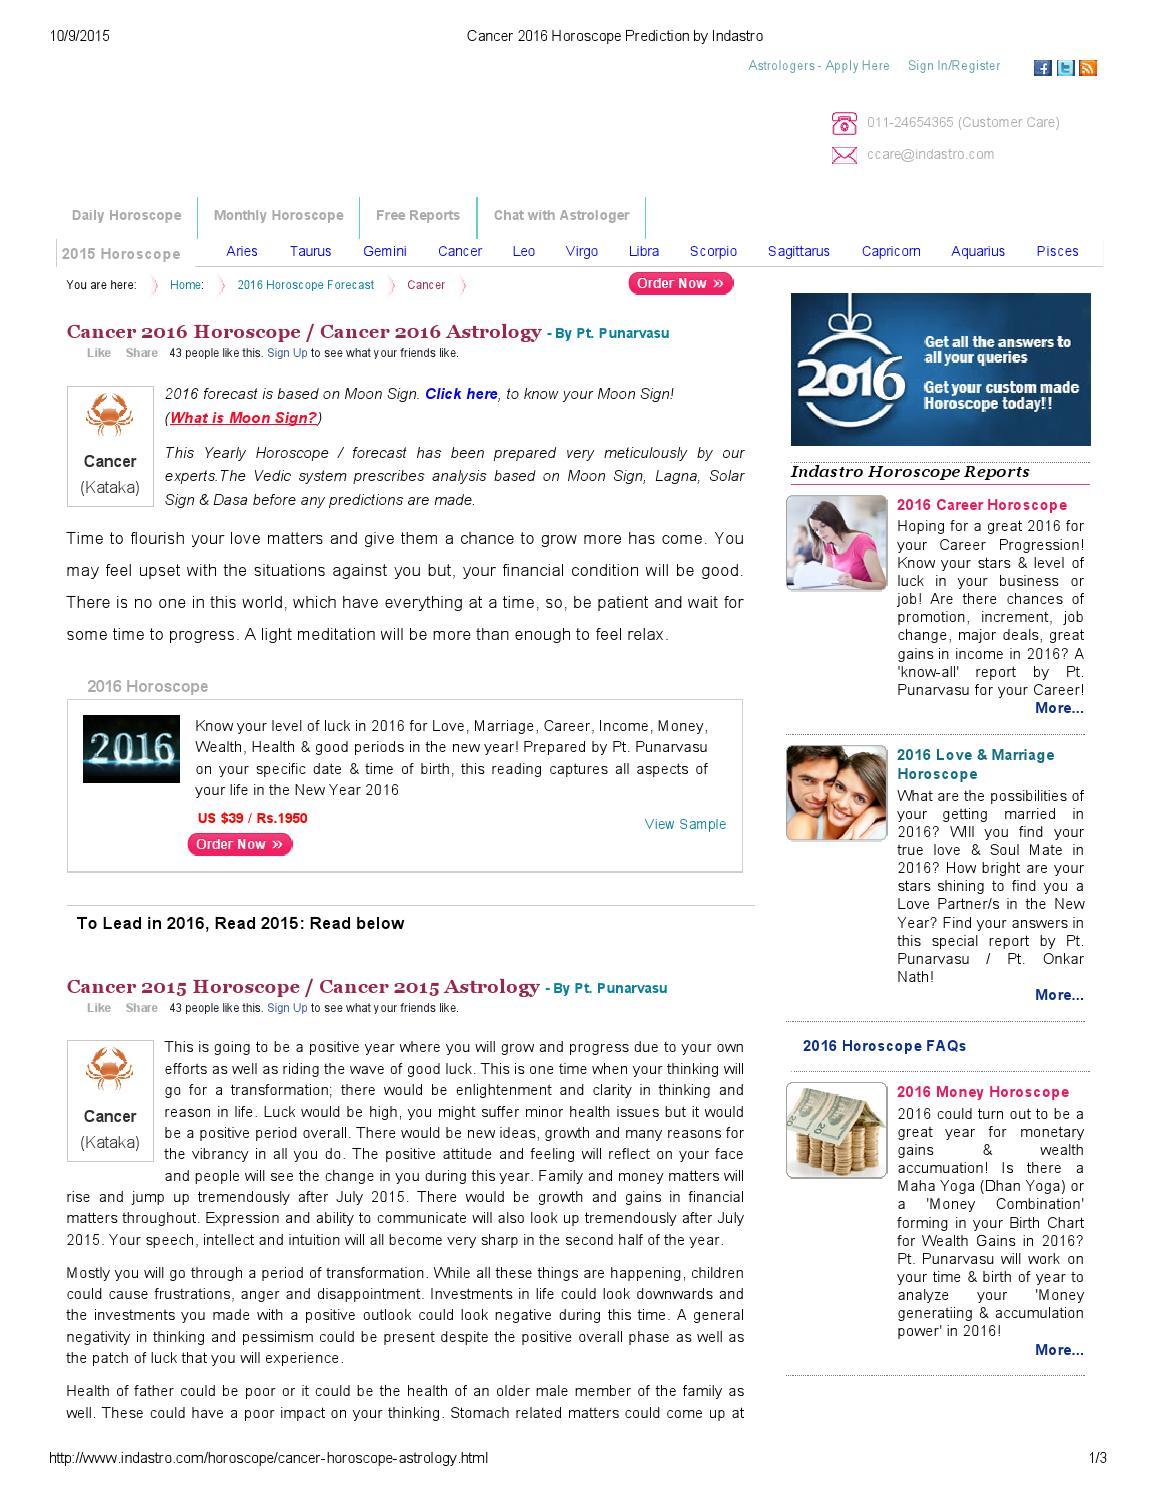 Cancer 20 horoscope prediction by indastro by Punarvasu Pandit ...